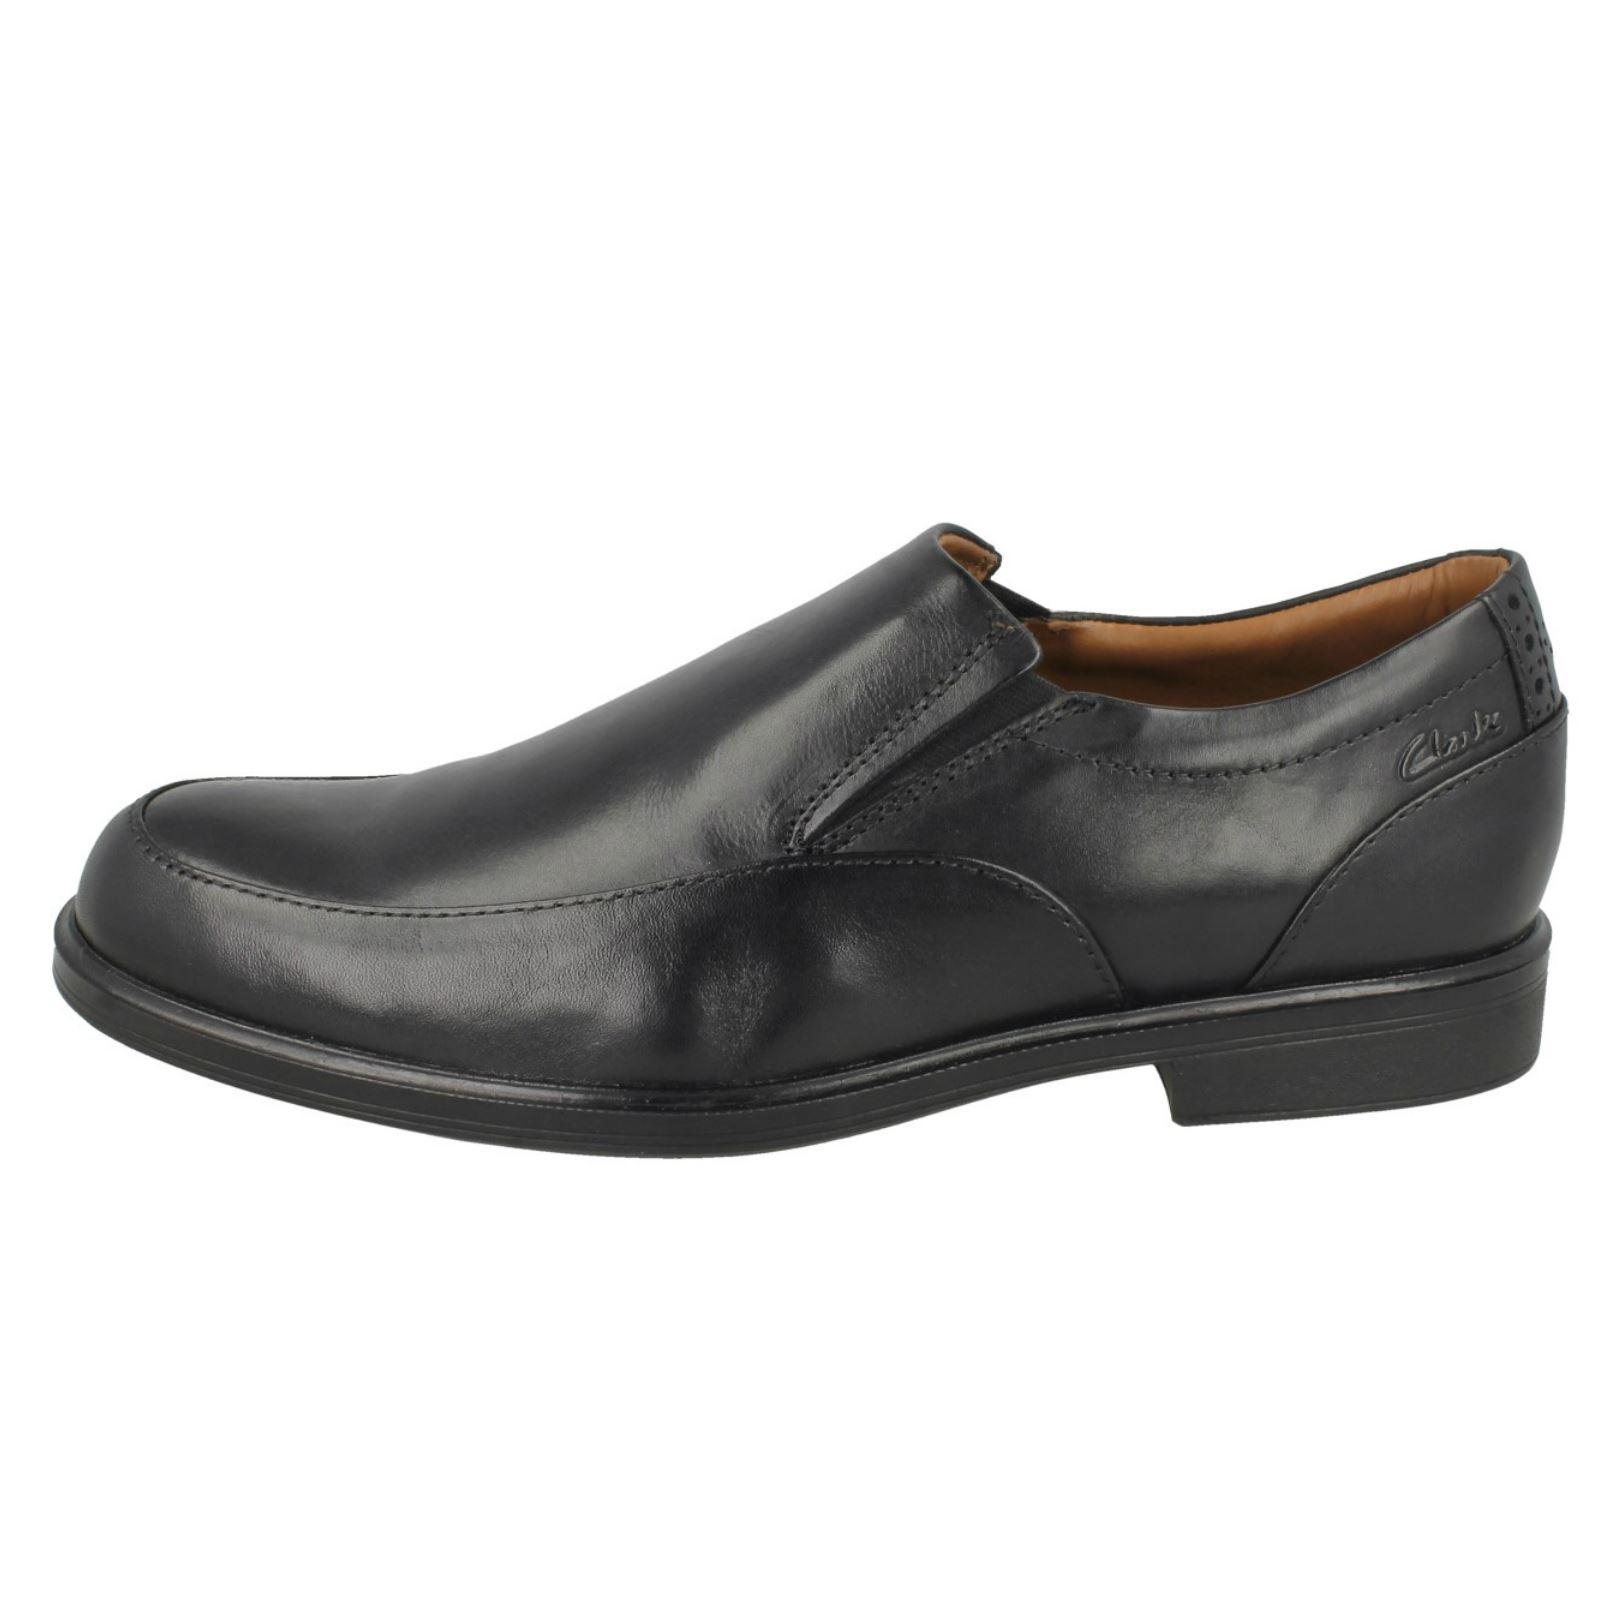 Sin Zapatos Vestir Clarks Hombre Step Cordones De Gabson nvpZwwxq4I